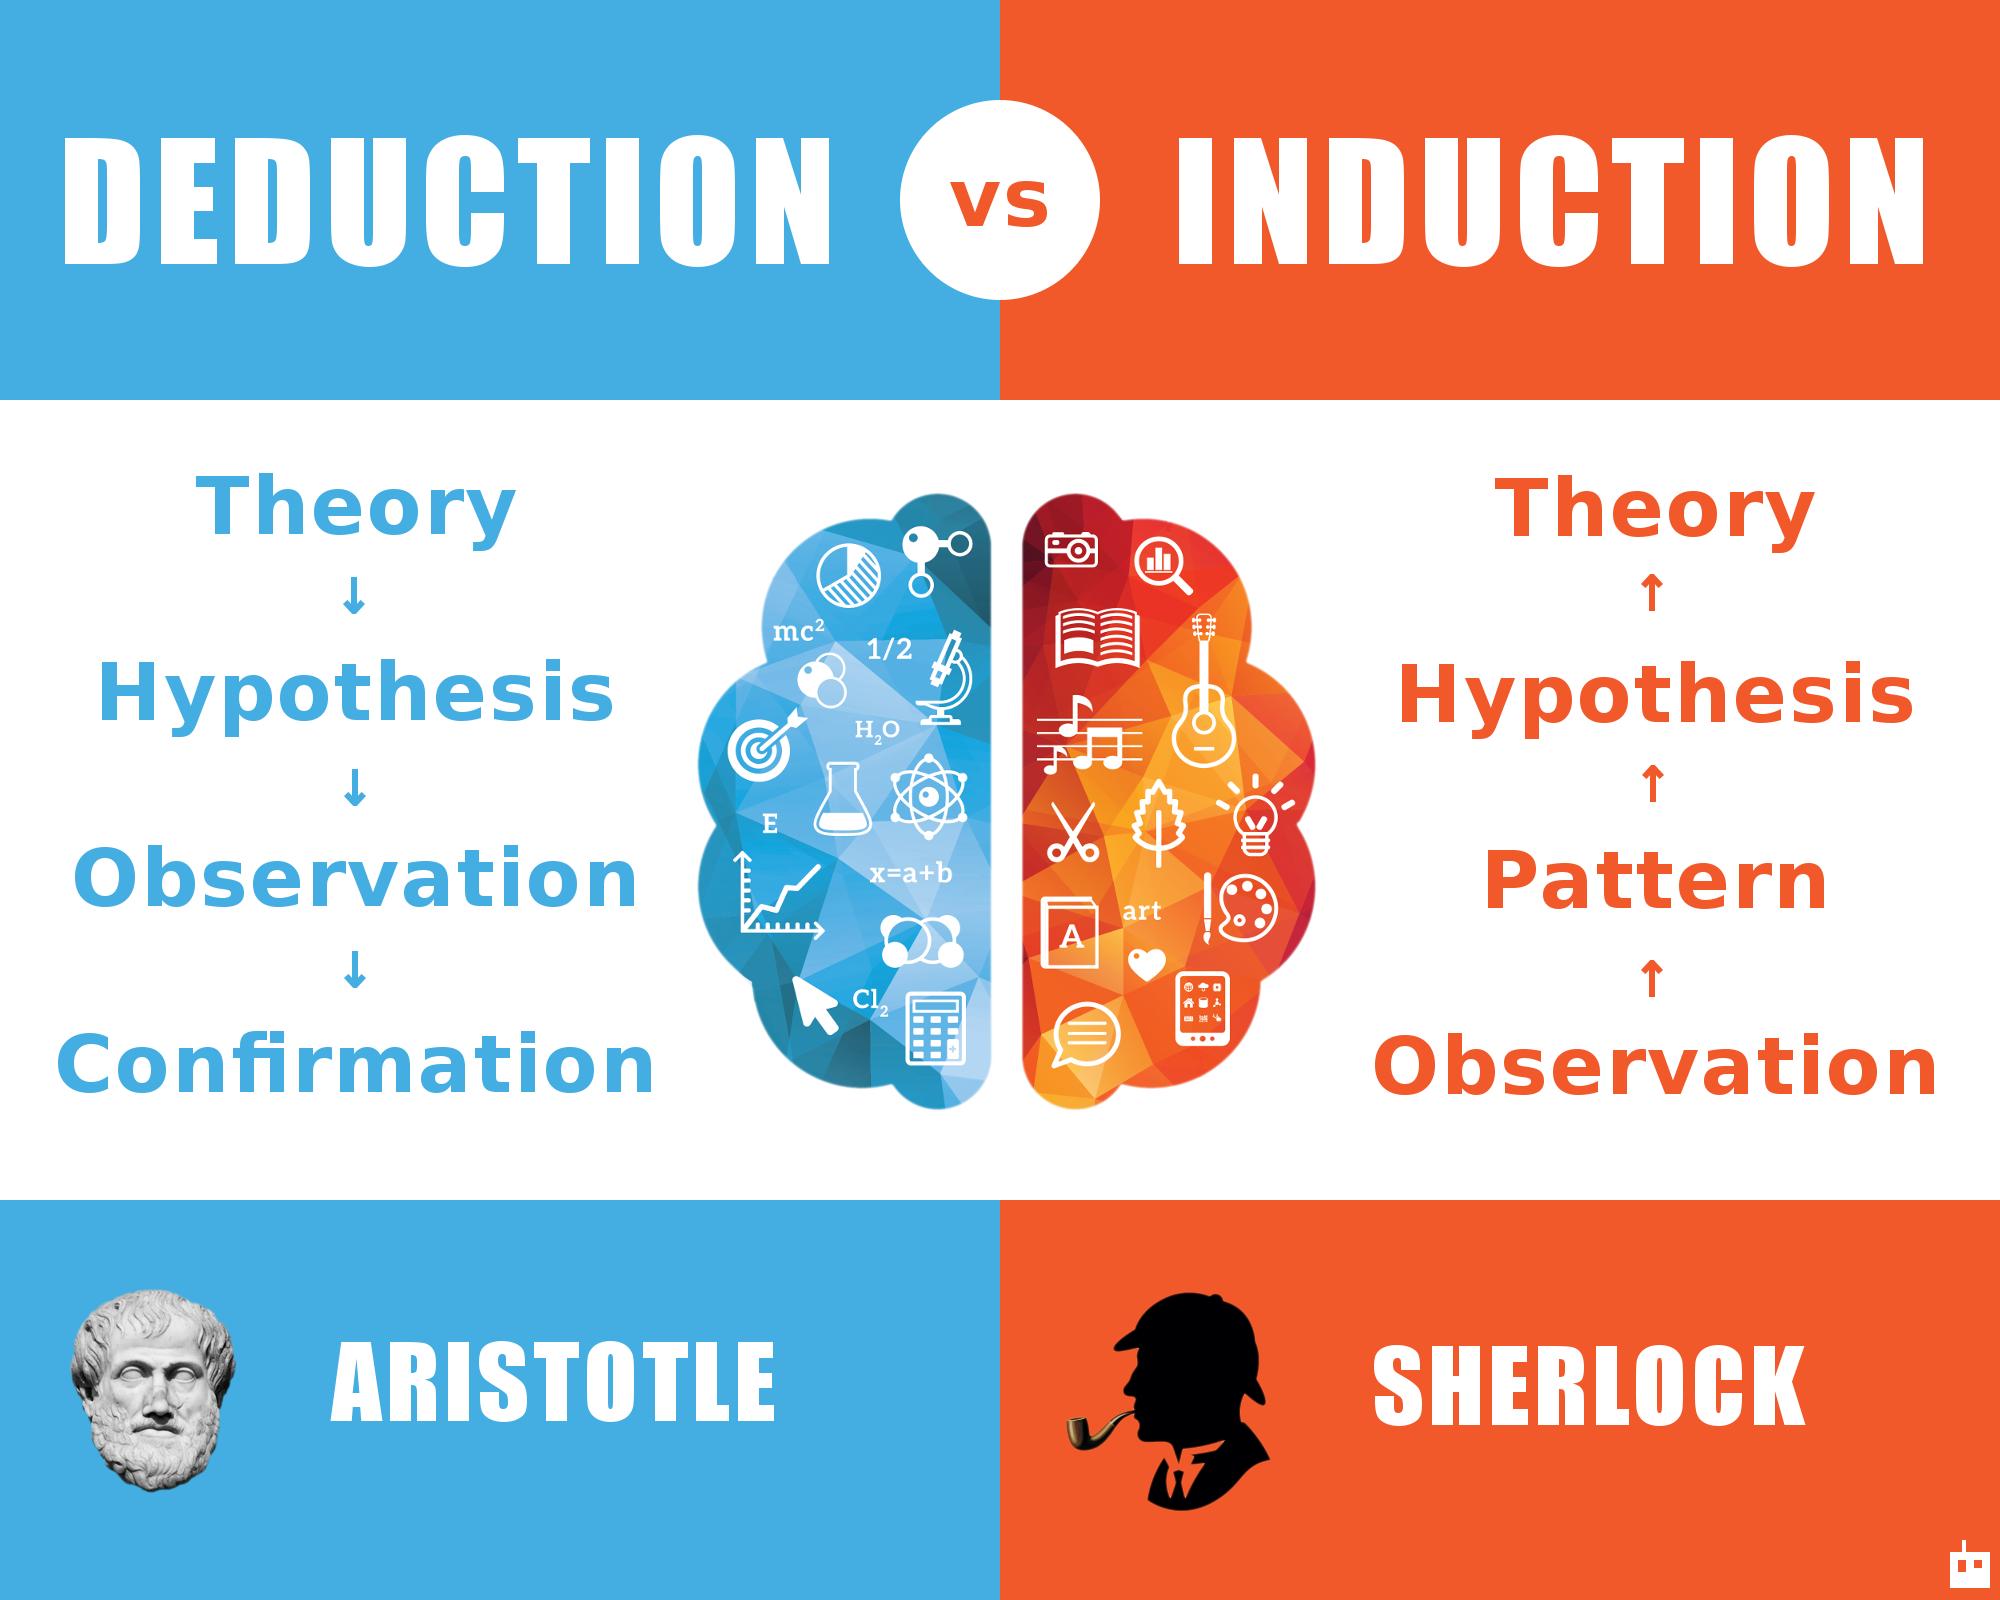 deduction-vs-induction.png